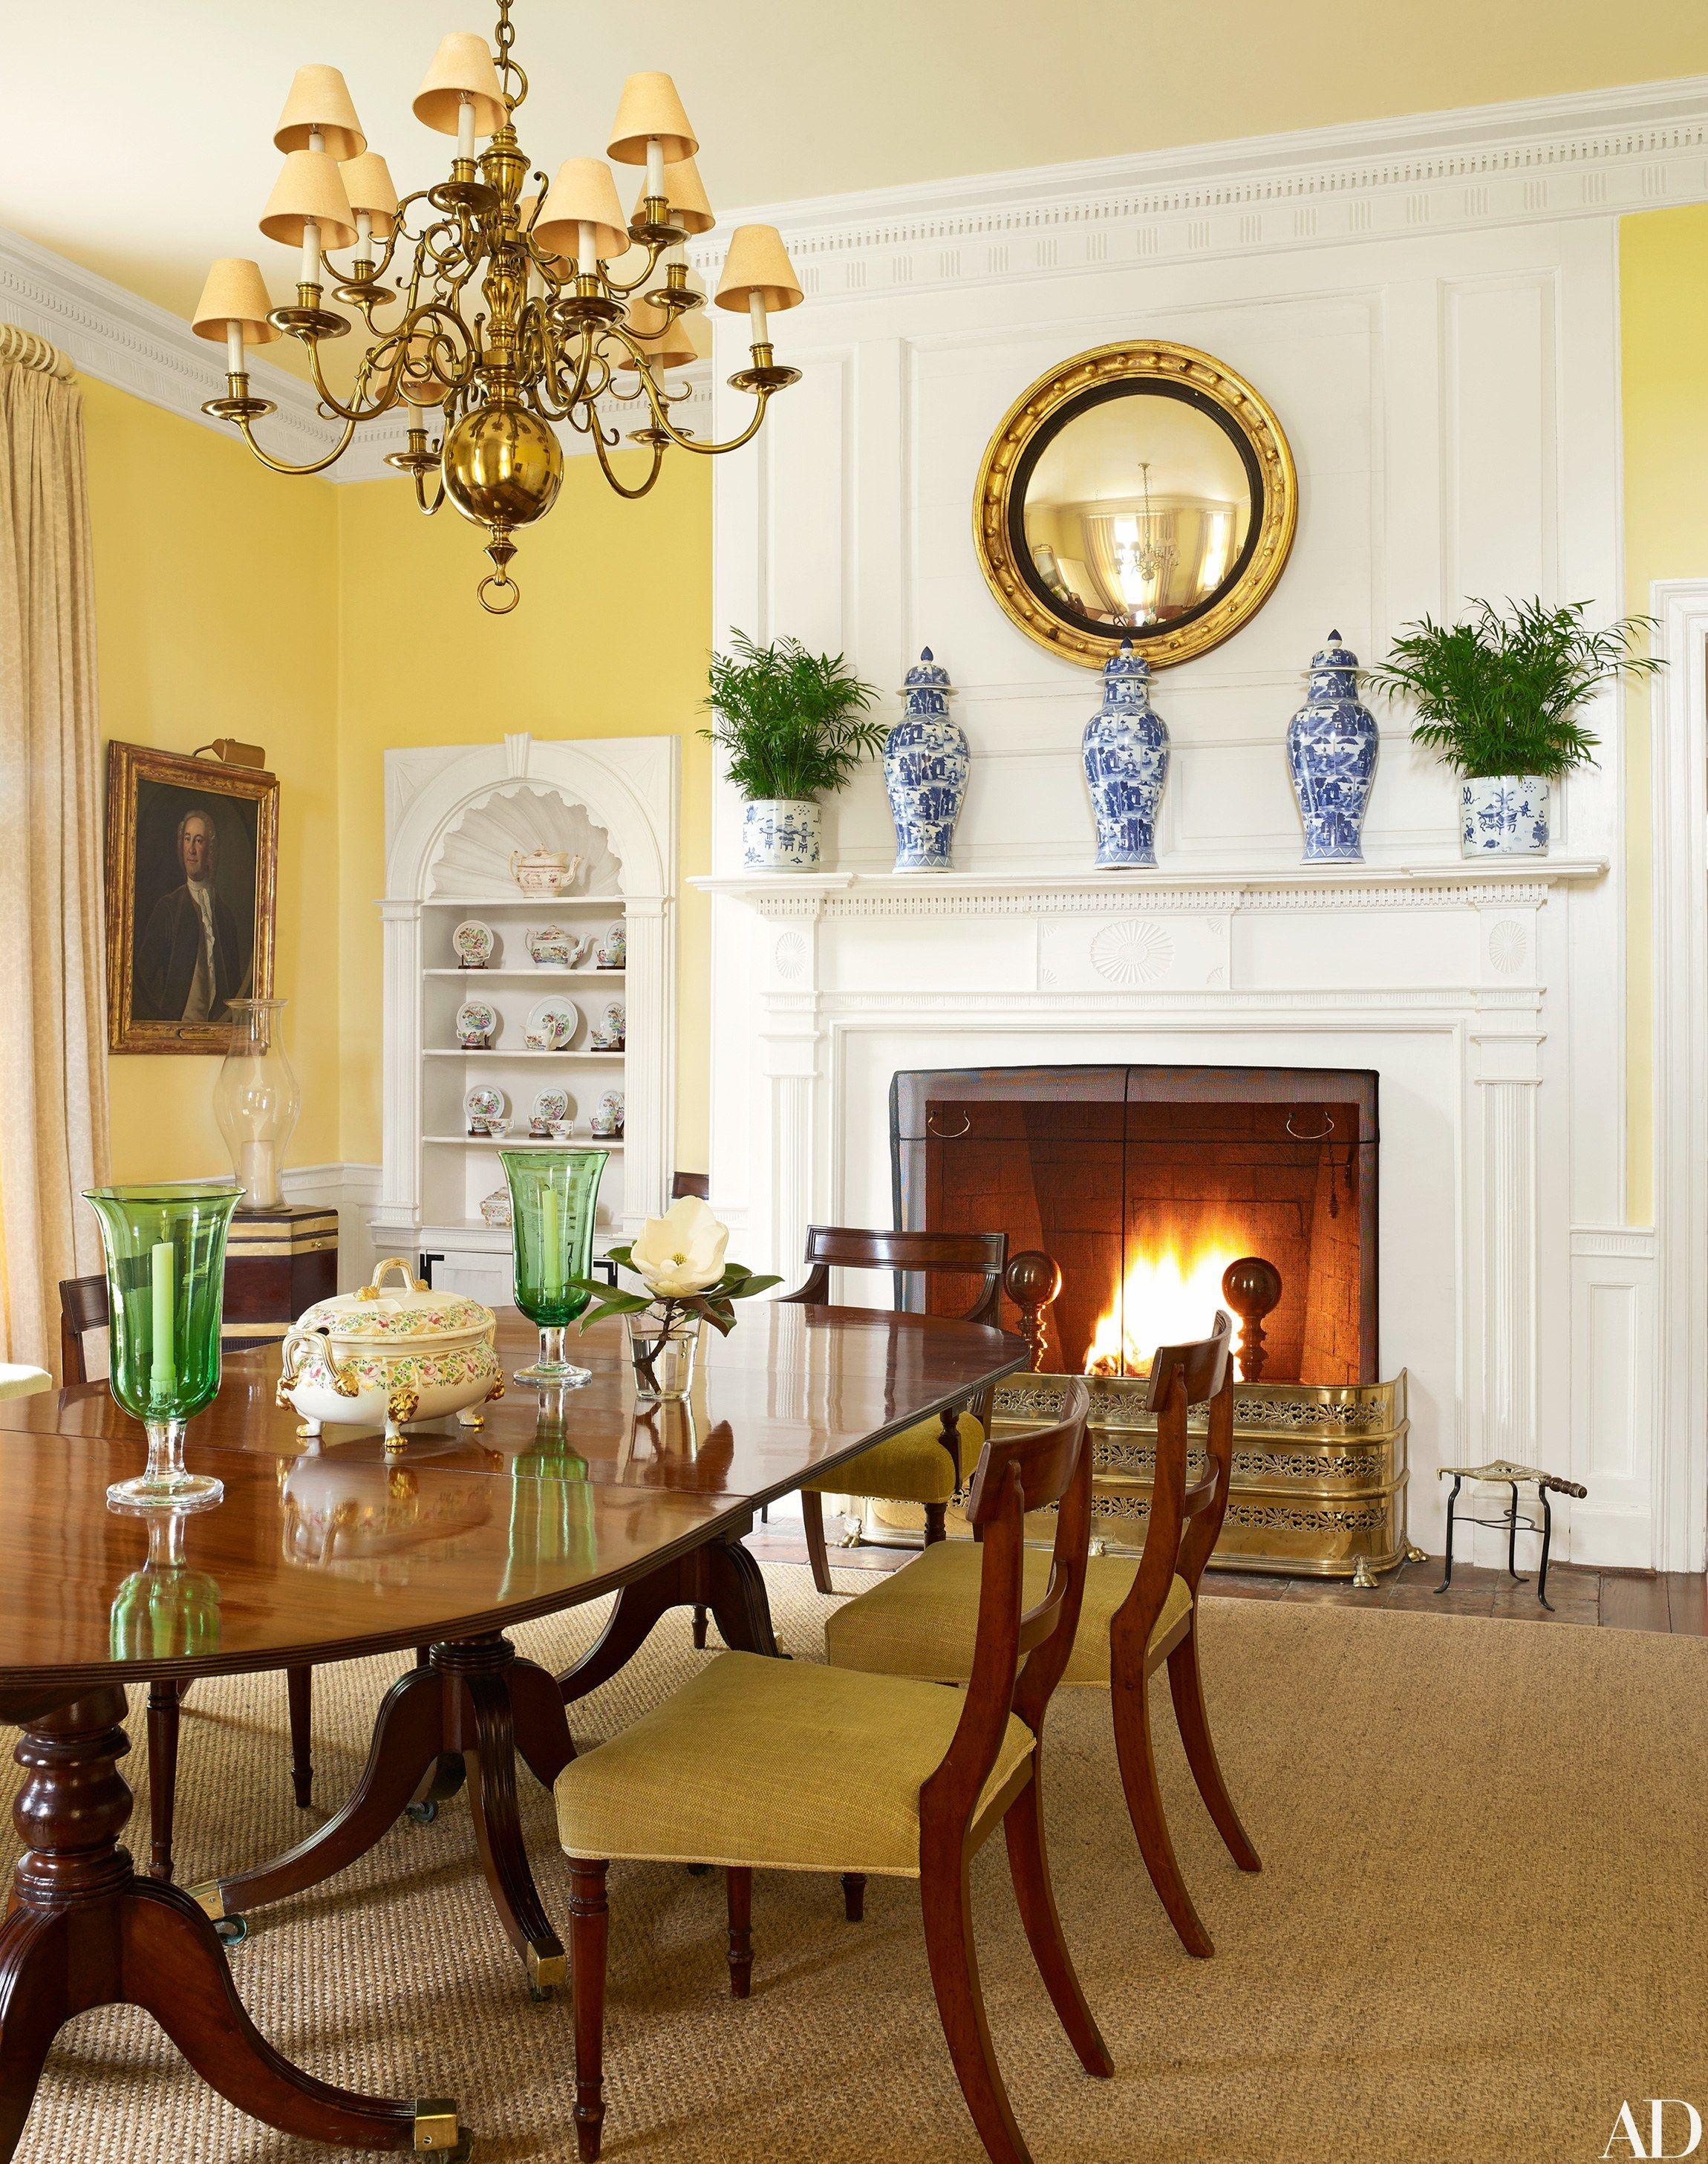 Go inside a historic south carolina plantation house turned family